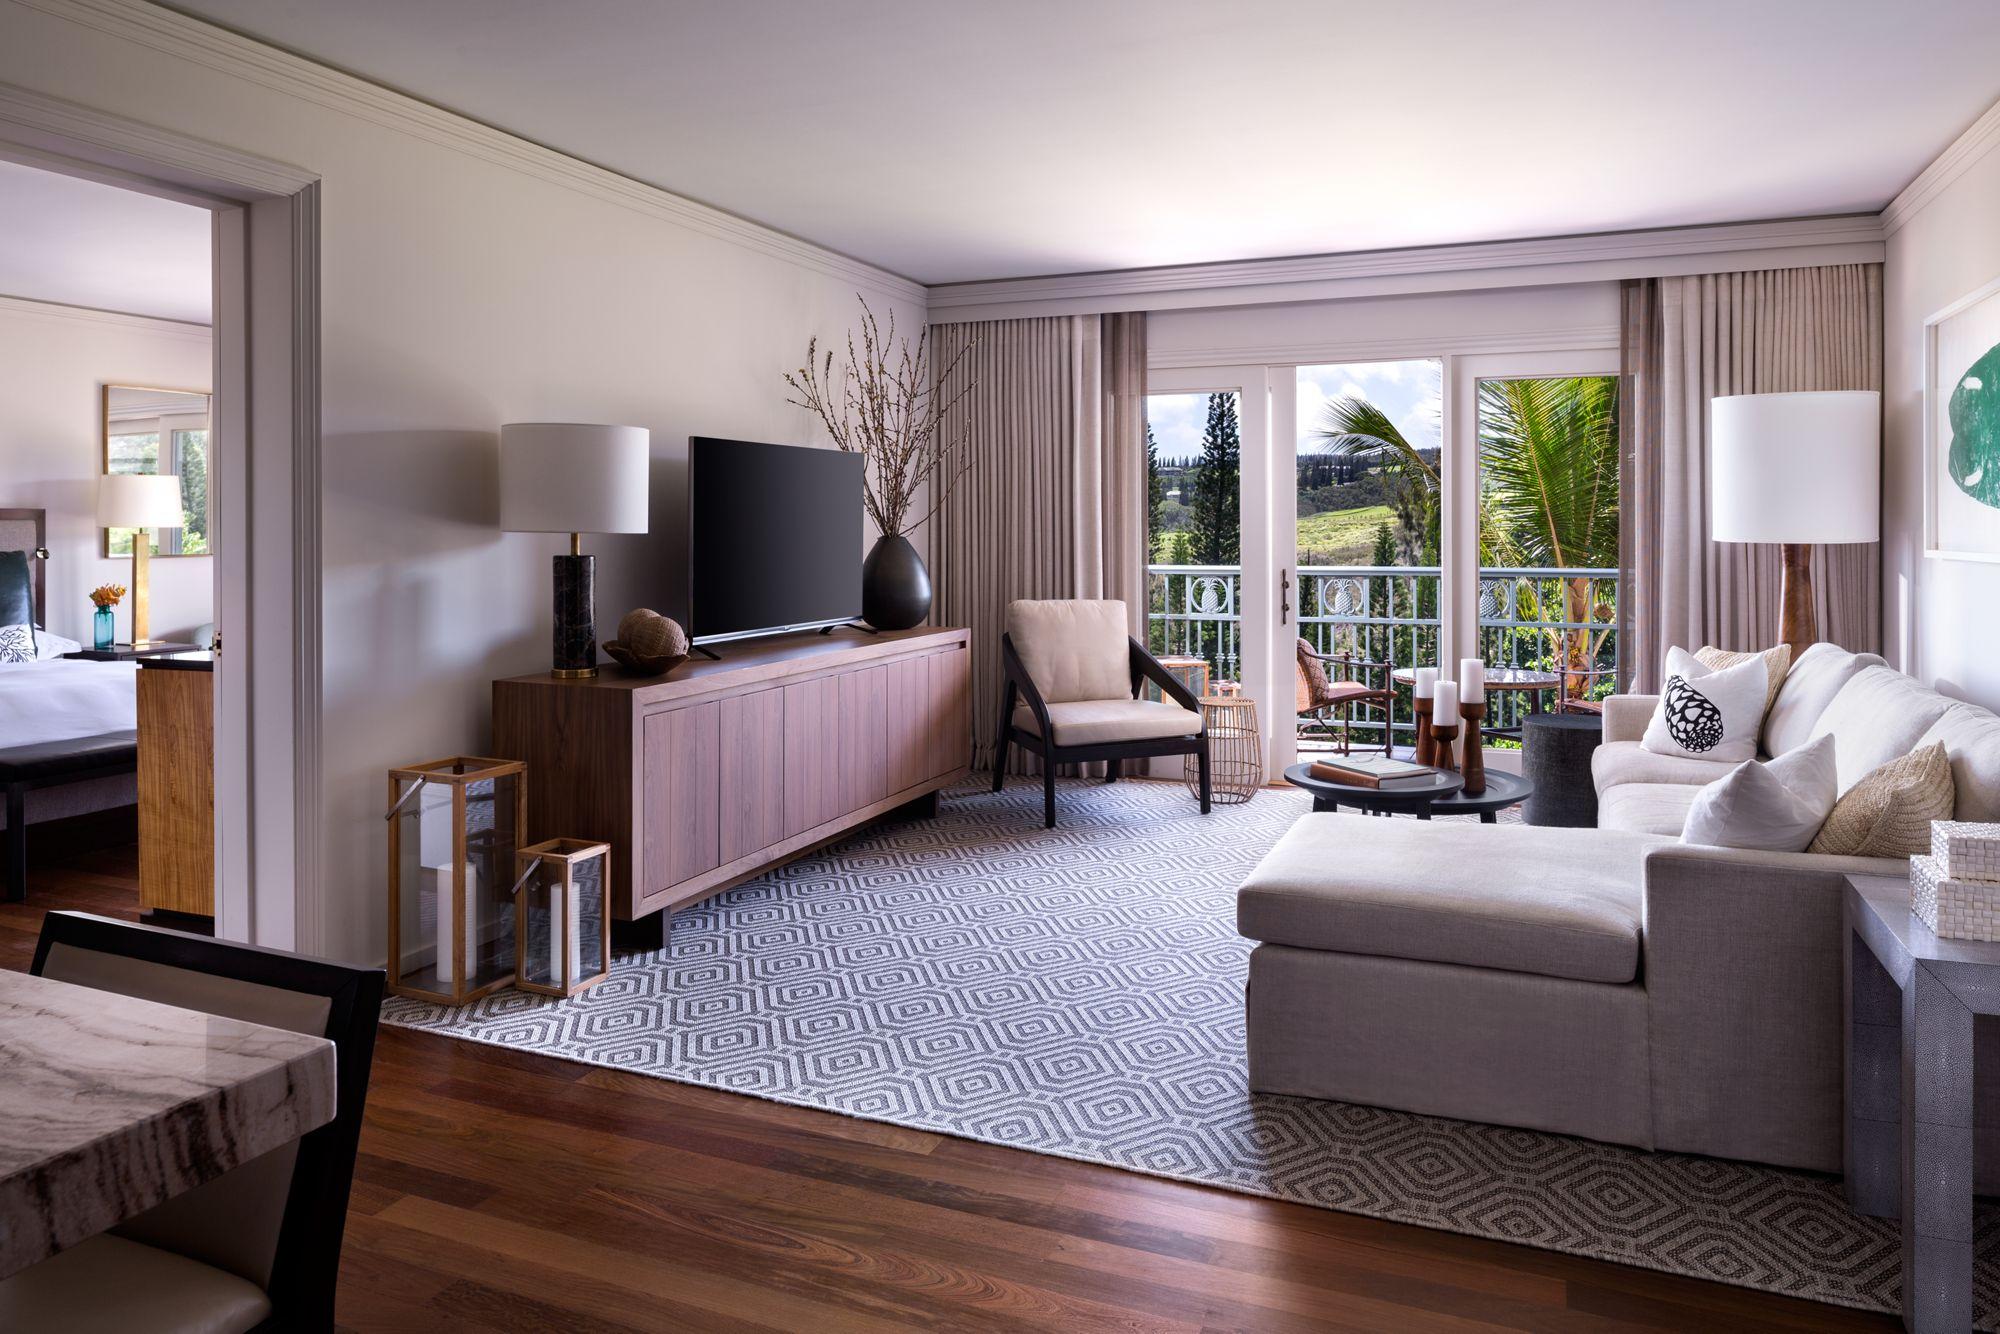 The Ritz-Carlton, Kapalua image 4